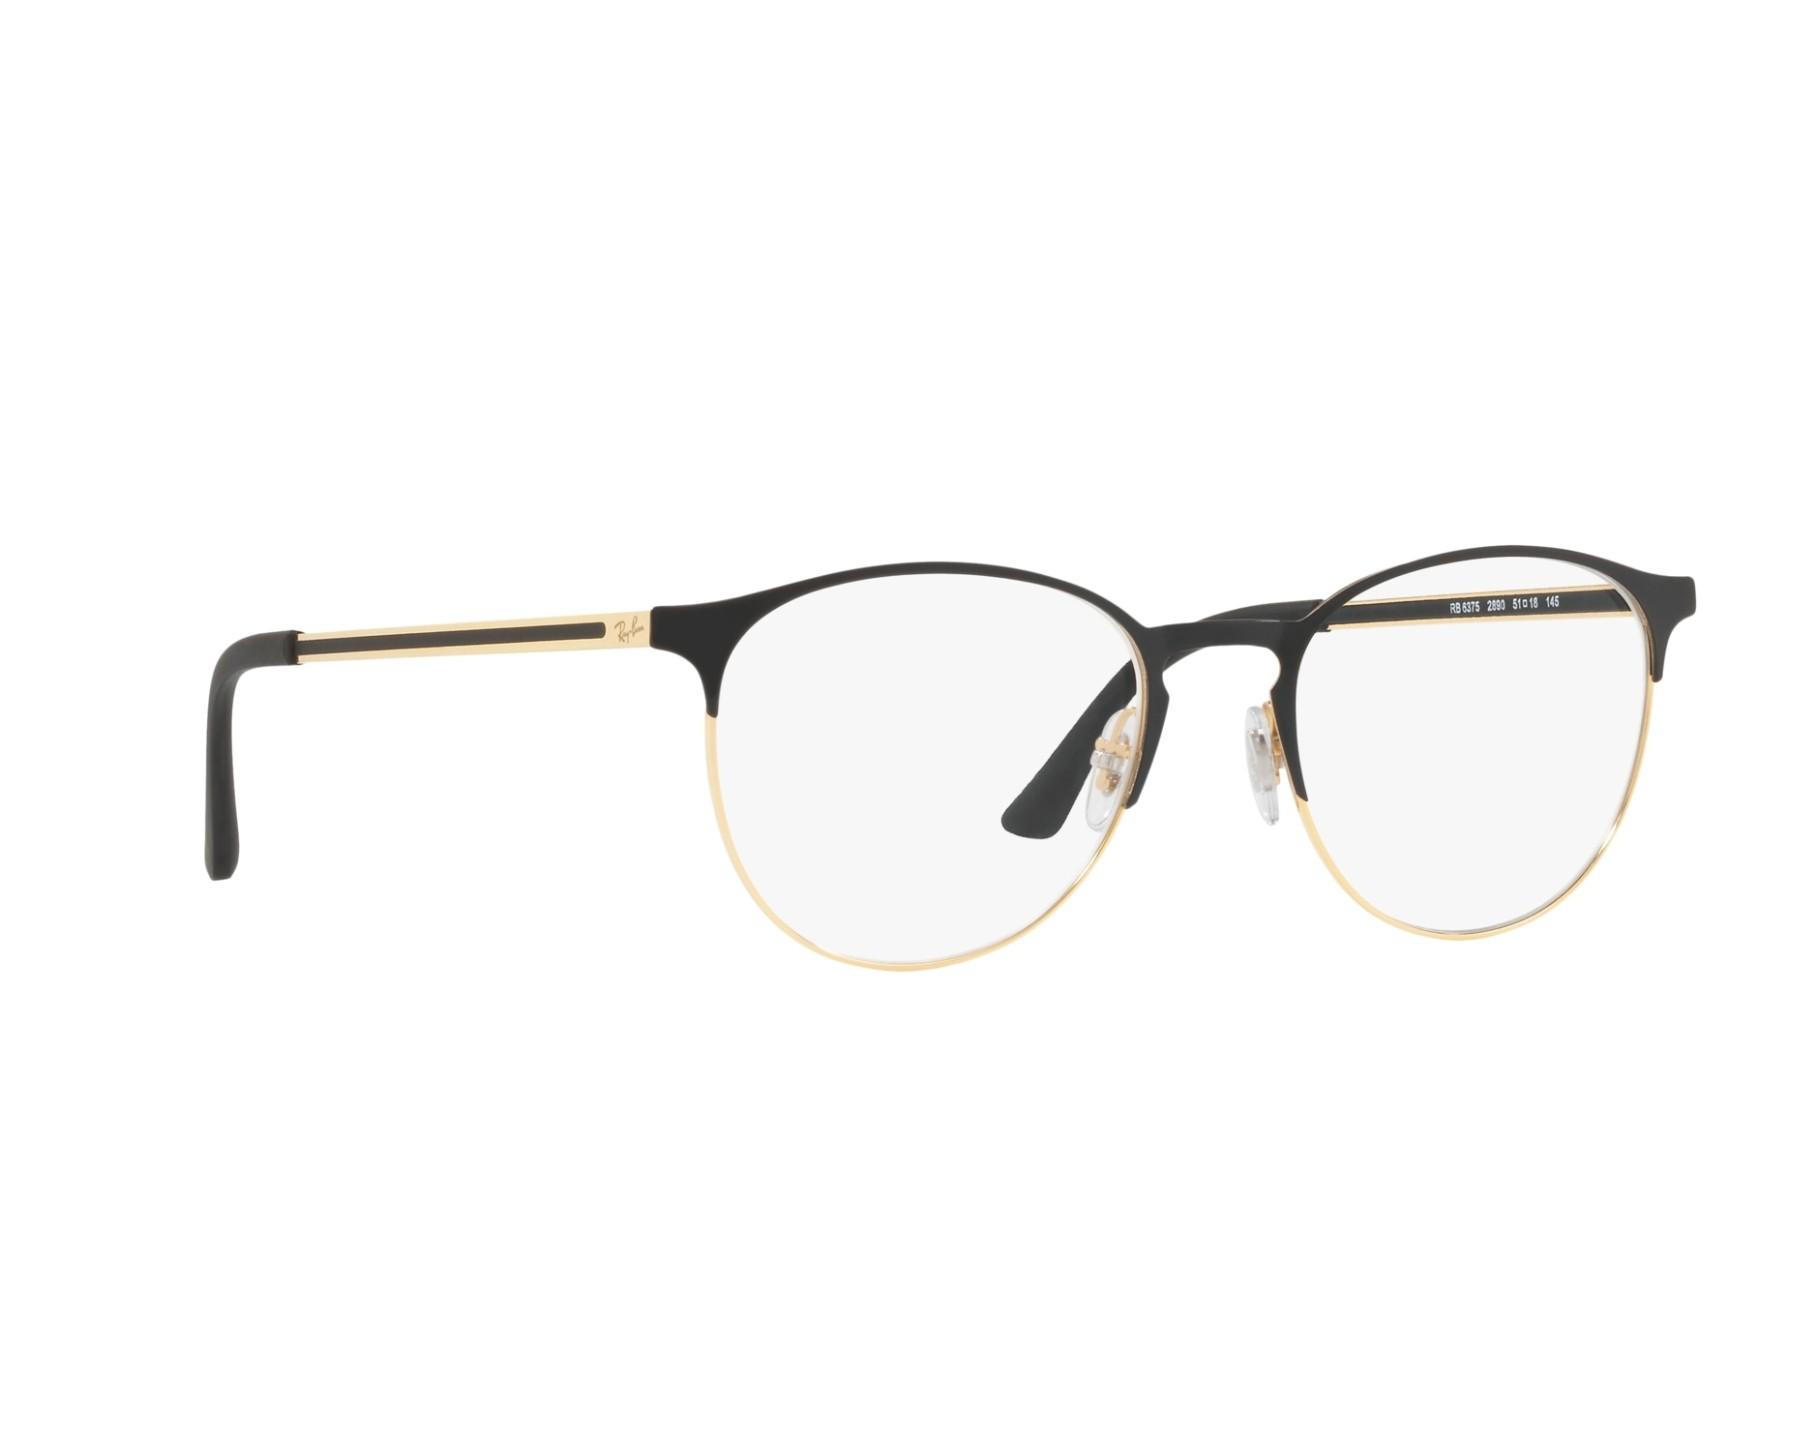 78918d7018e eyeglasses Ray-Ban RX-6375 2890 51-18 Black Gold 360 degree view